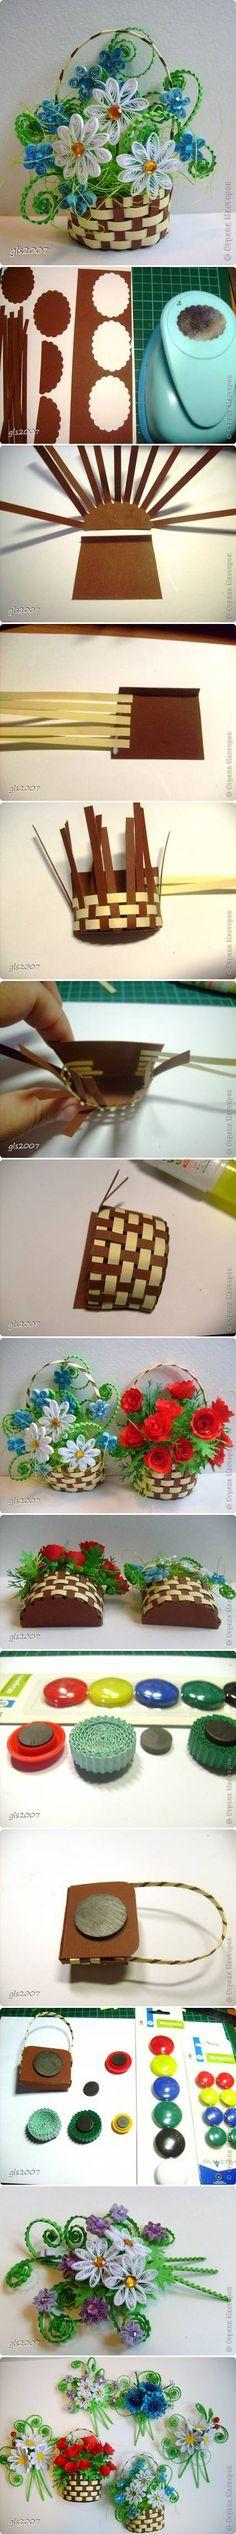 DIY Woven Paper Flower Basket 2